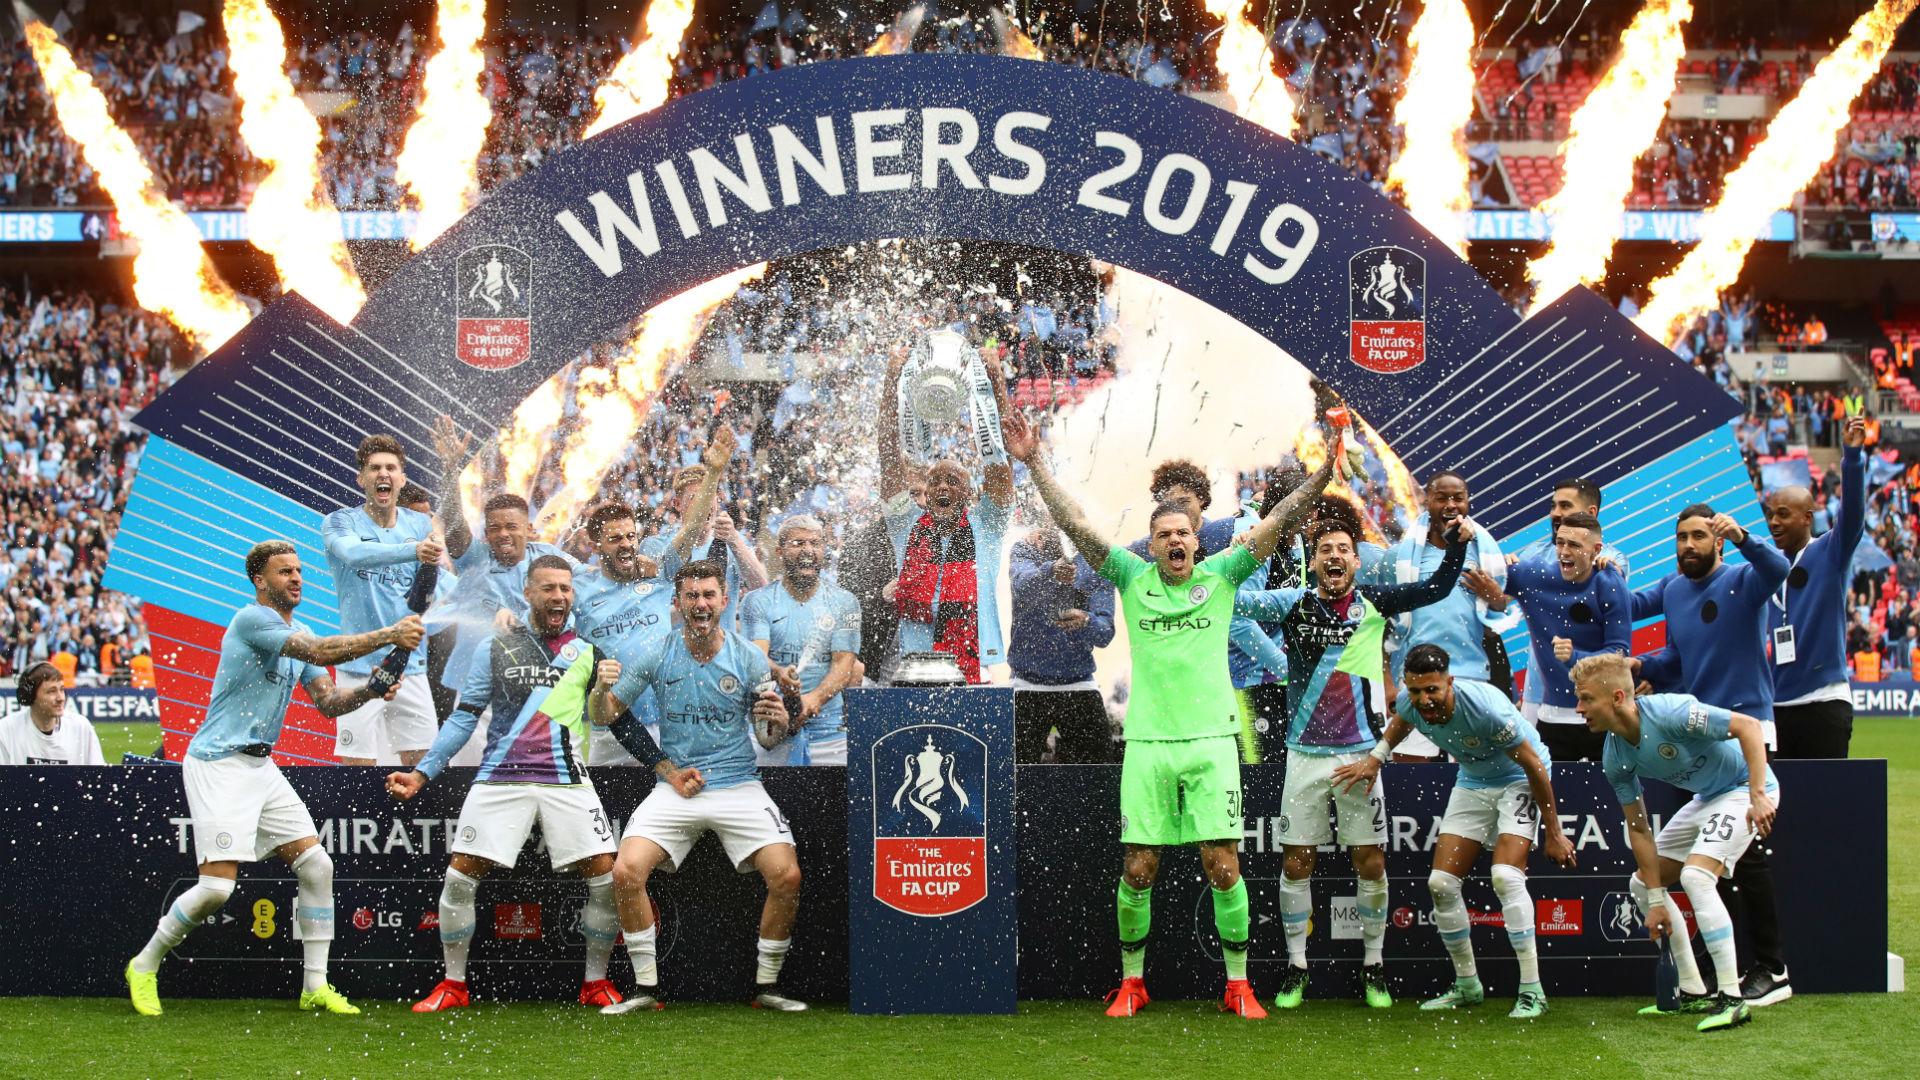 manchester-city-fa-cup-winners-2019_15e8rdvbzgy001ue3yirphidi1.jpg?t=-873264214&quality=100.png